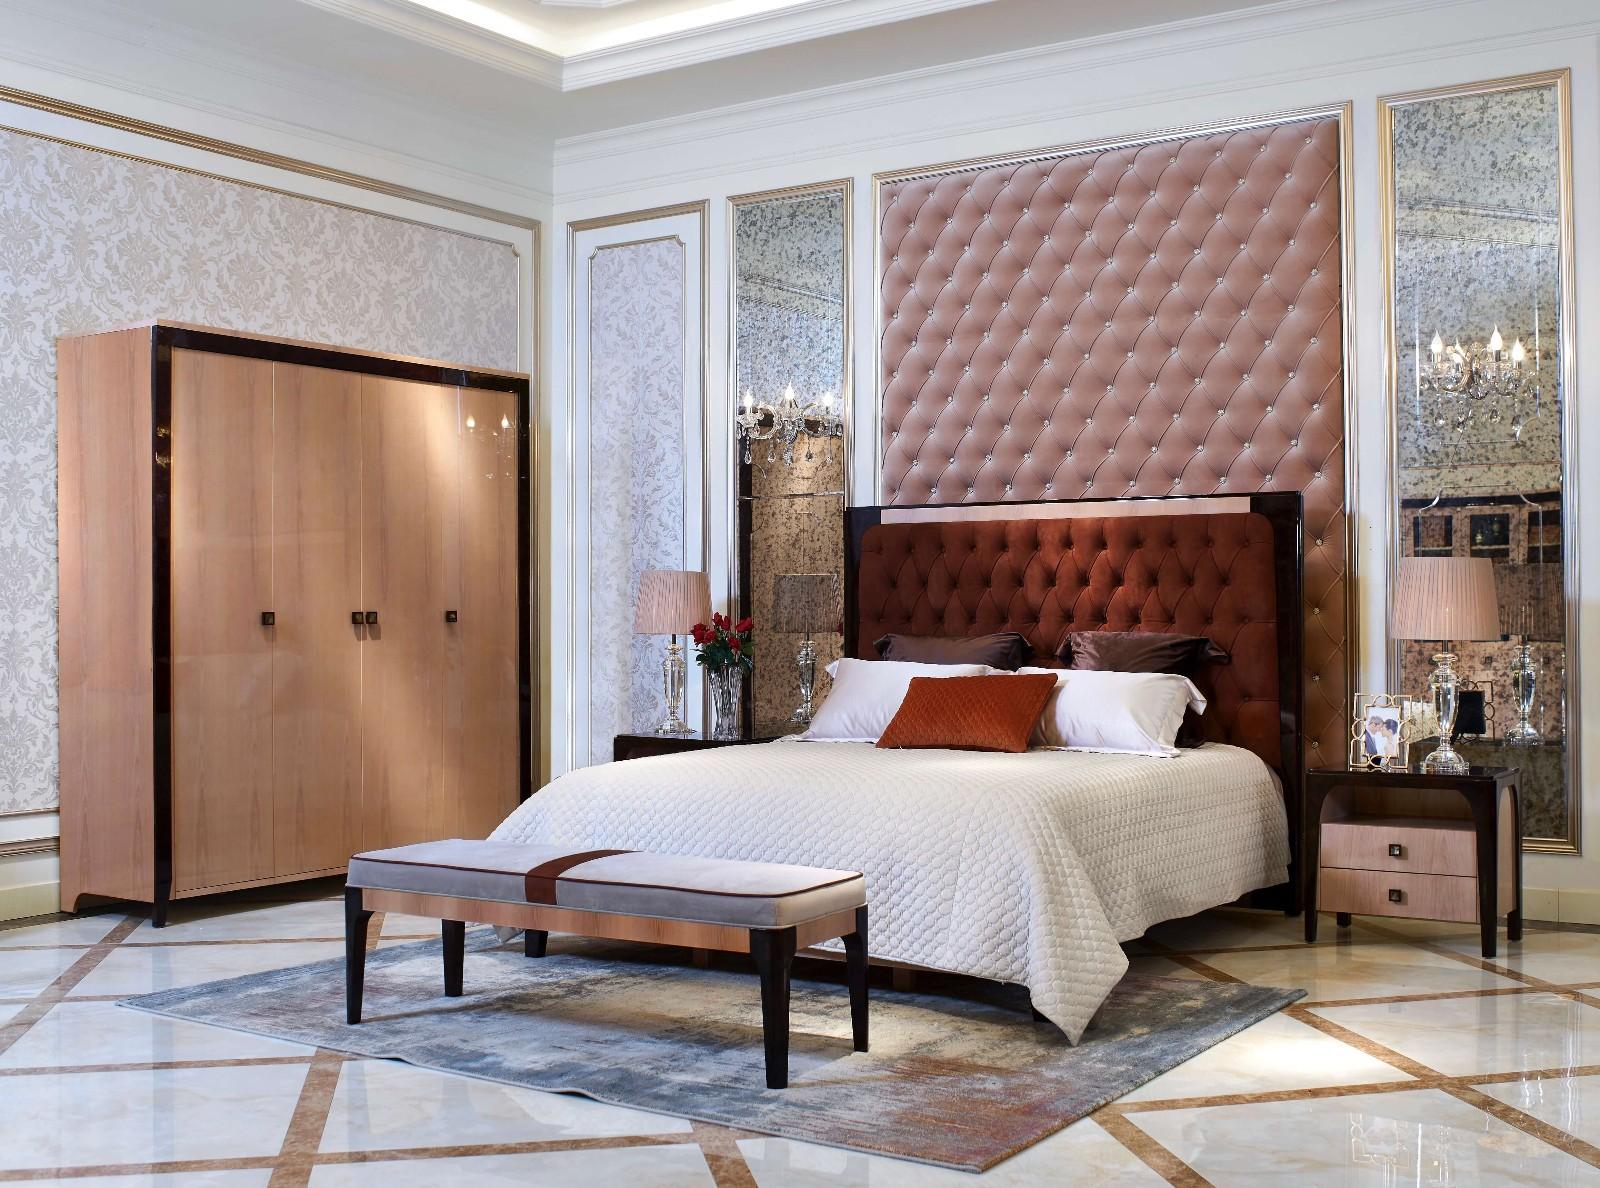 product-Modern luxury style bedroom furniture 0075-Senbetter-img